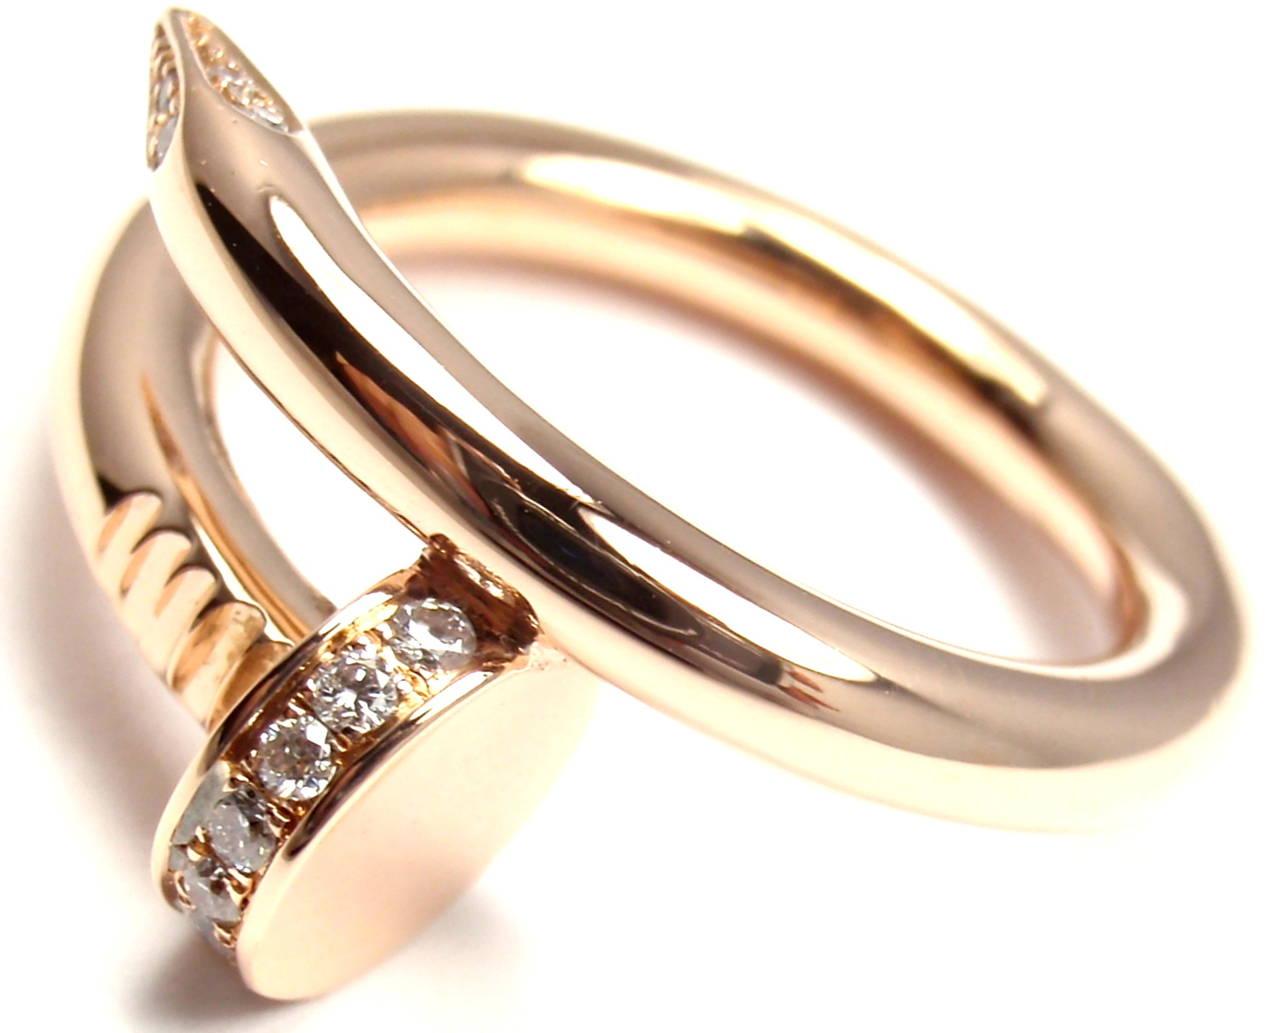 Cartier Juste un Clou Diamond Gold Nail Band Ring at 1stdibs